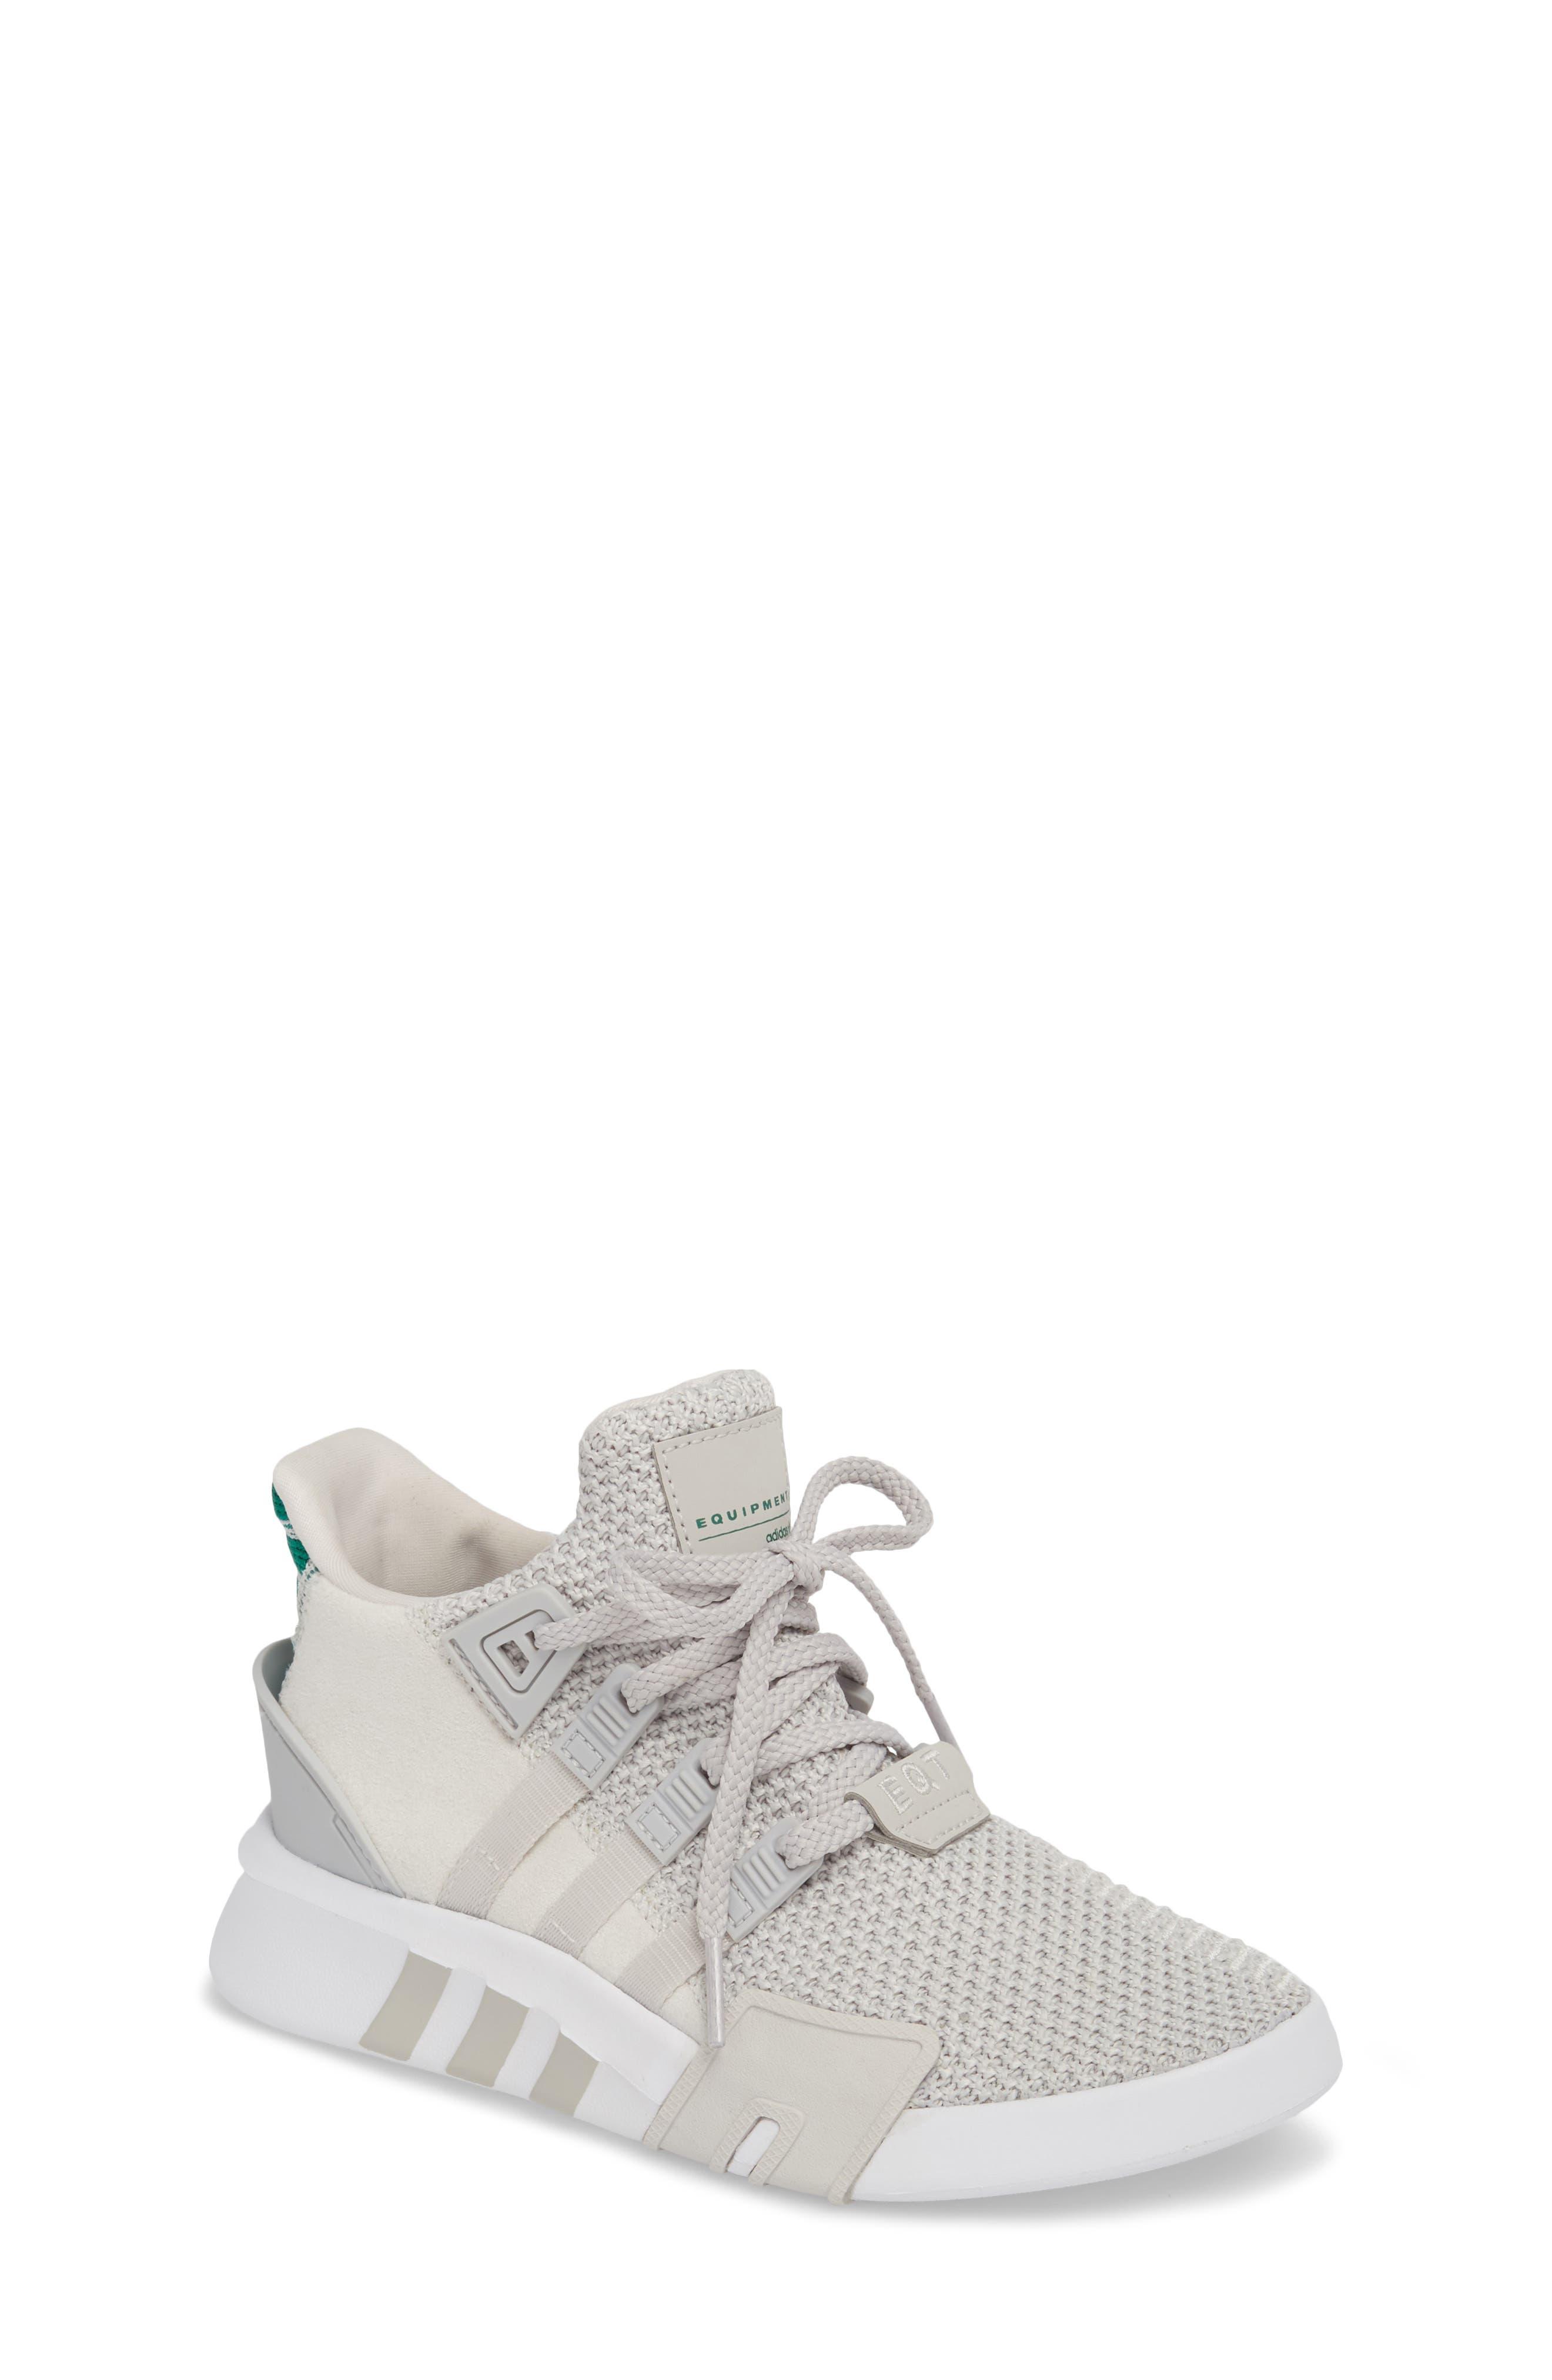 EQT Basketball ADV I Sneaker,                         Main,                         color, Grey / Grey / Green